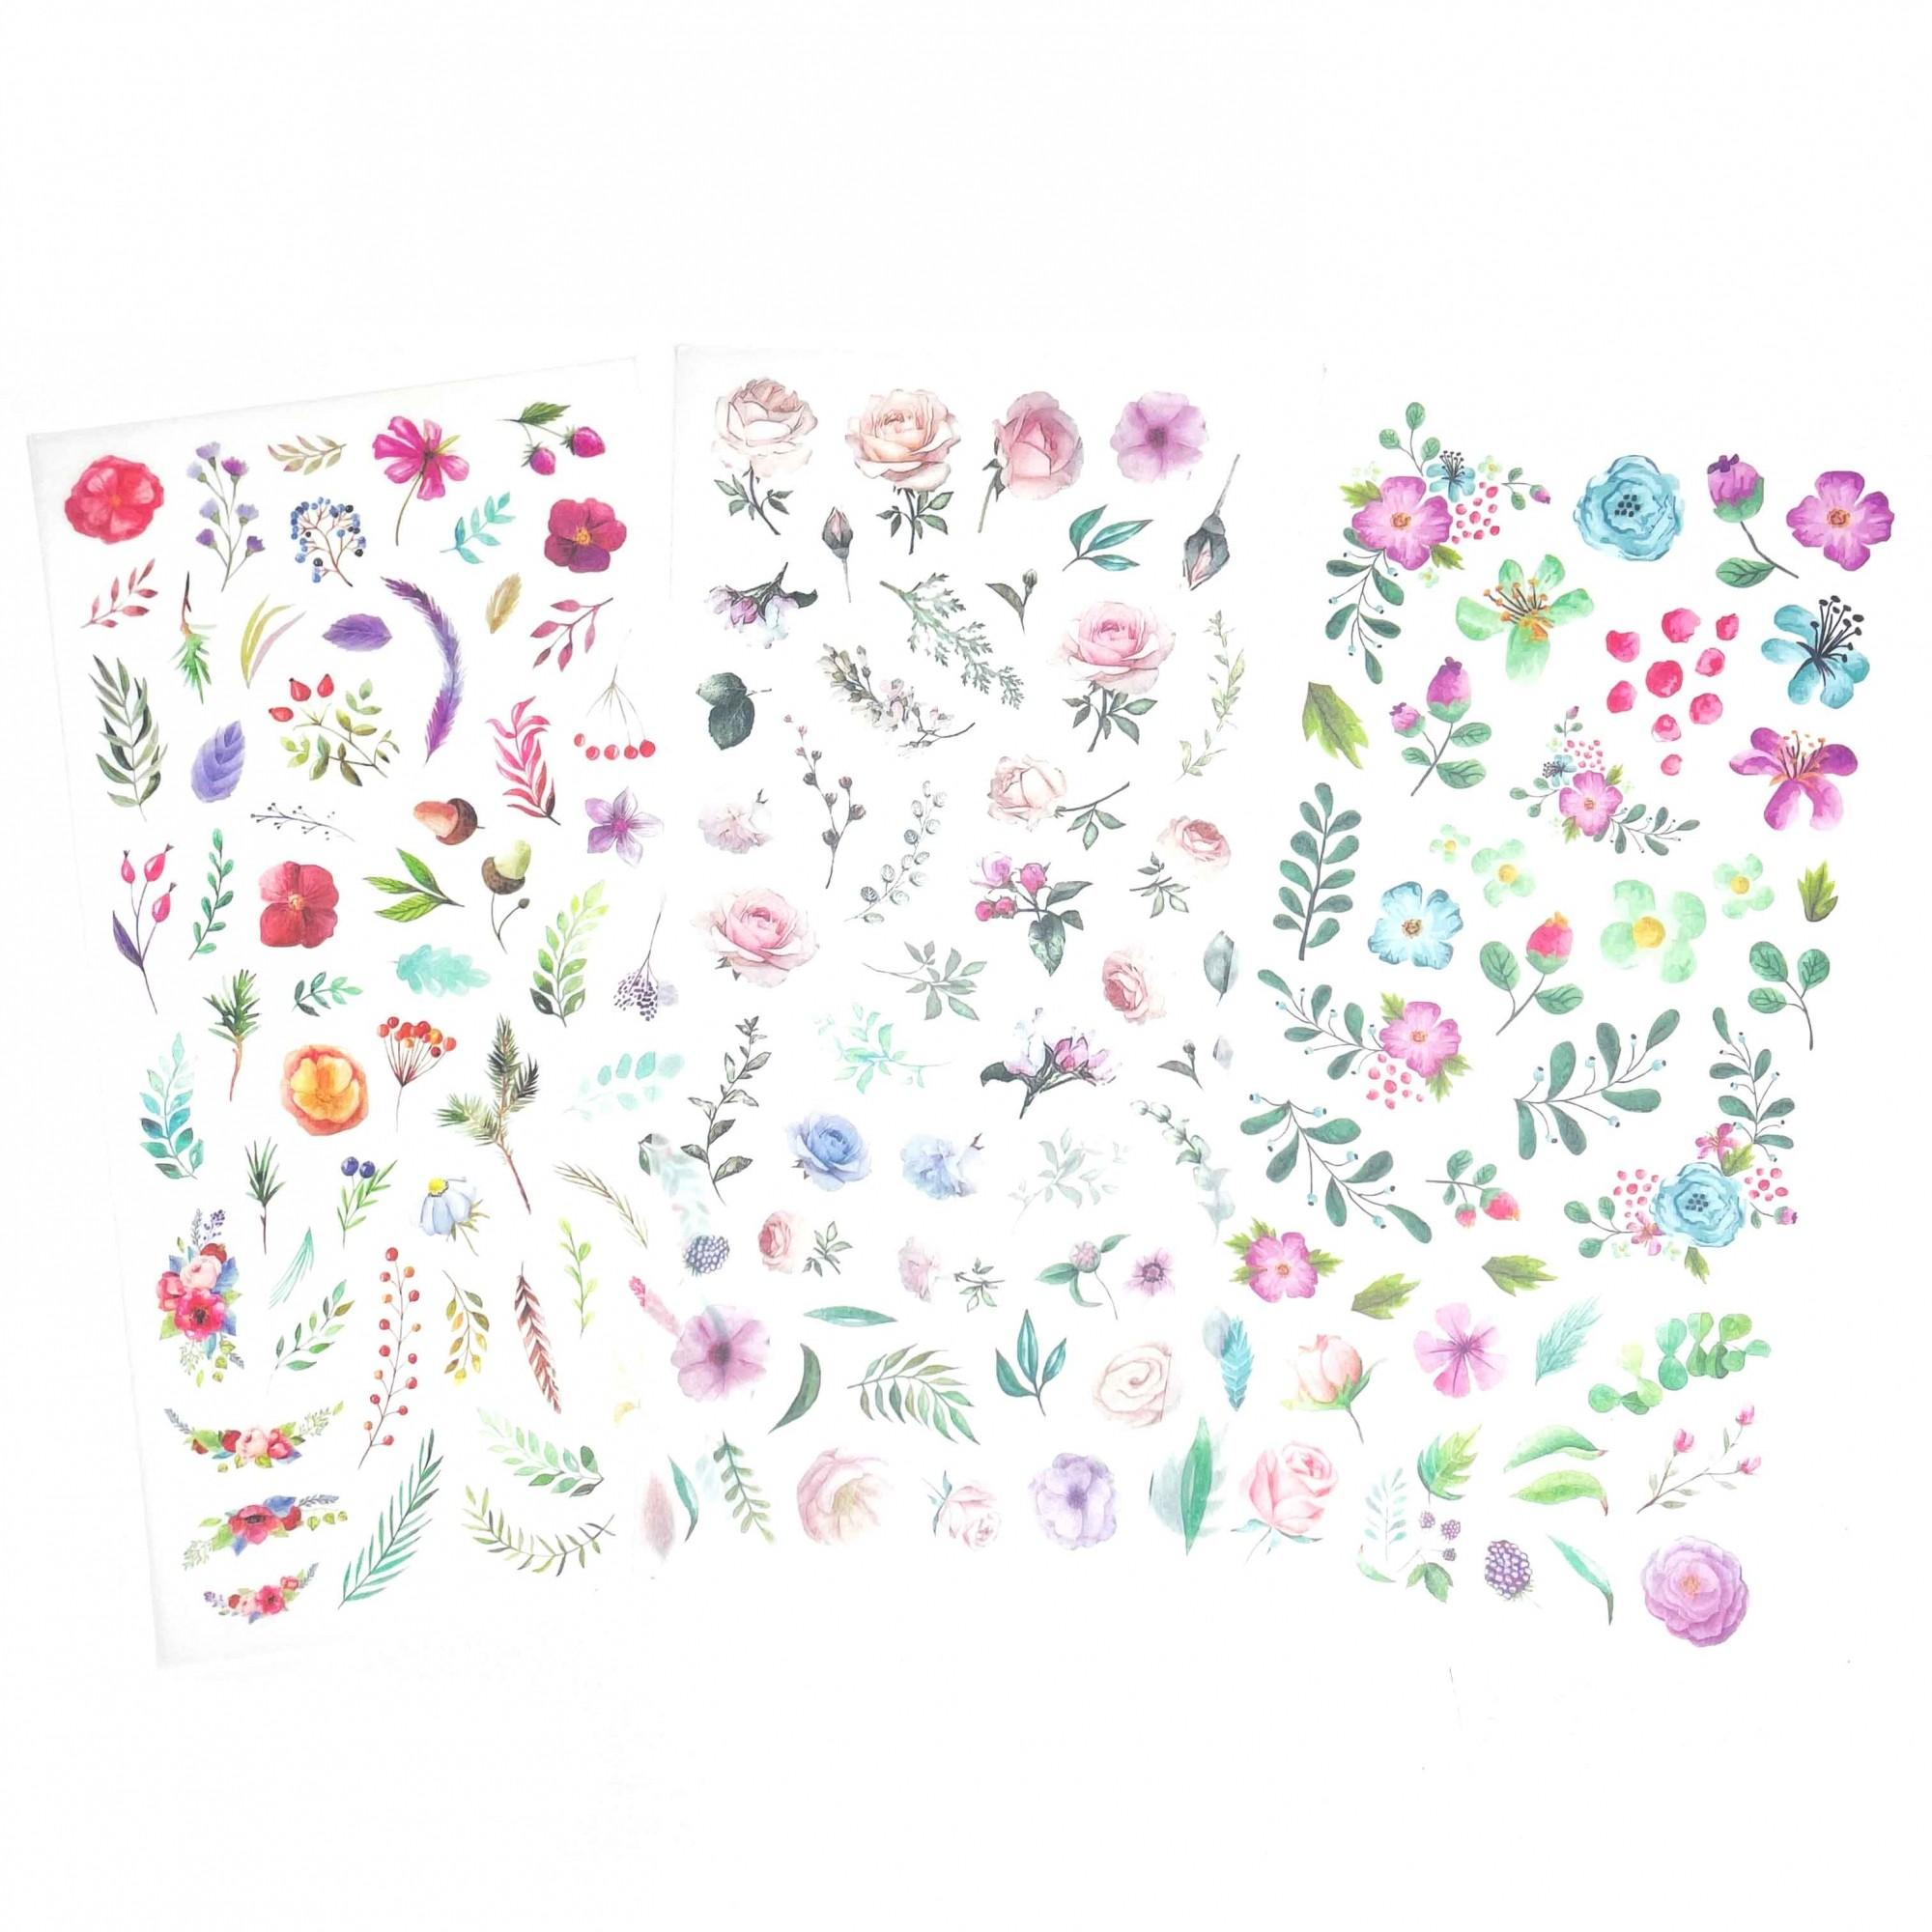 Adesivo Washi Flower - 3 folhas